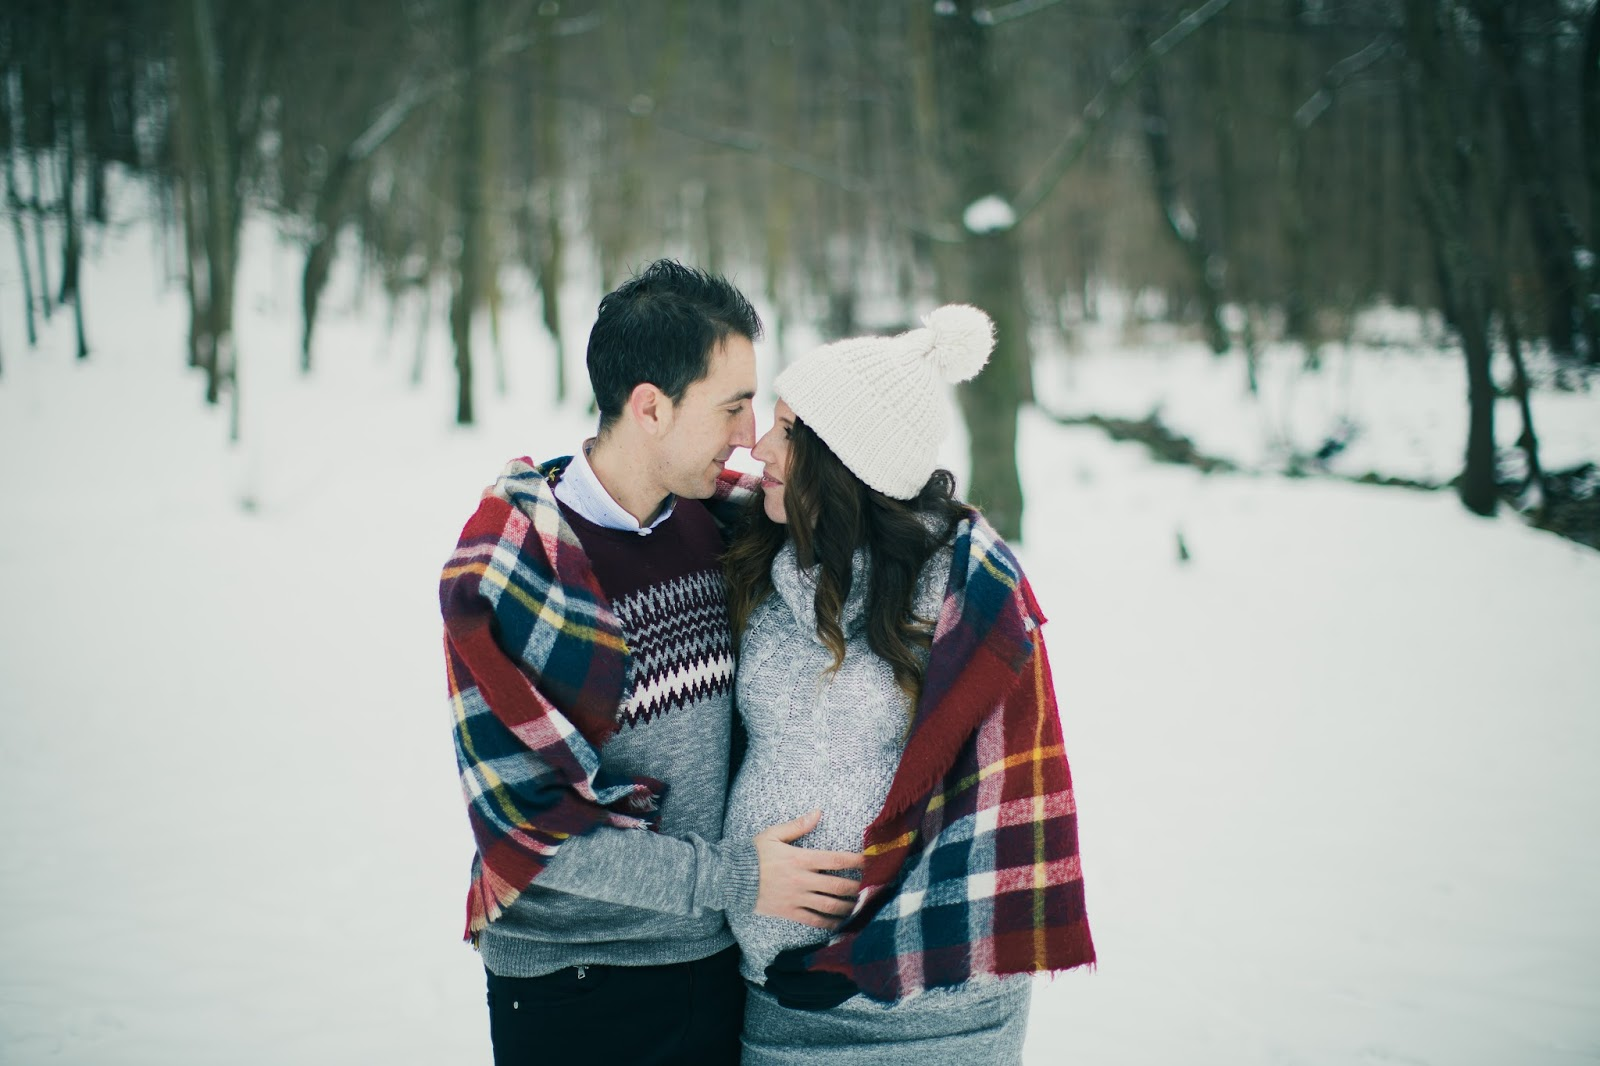 e1fc87d5f Dulce espera +Sesión embarazo en la nieve - Sweet Carol - Blog